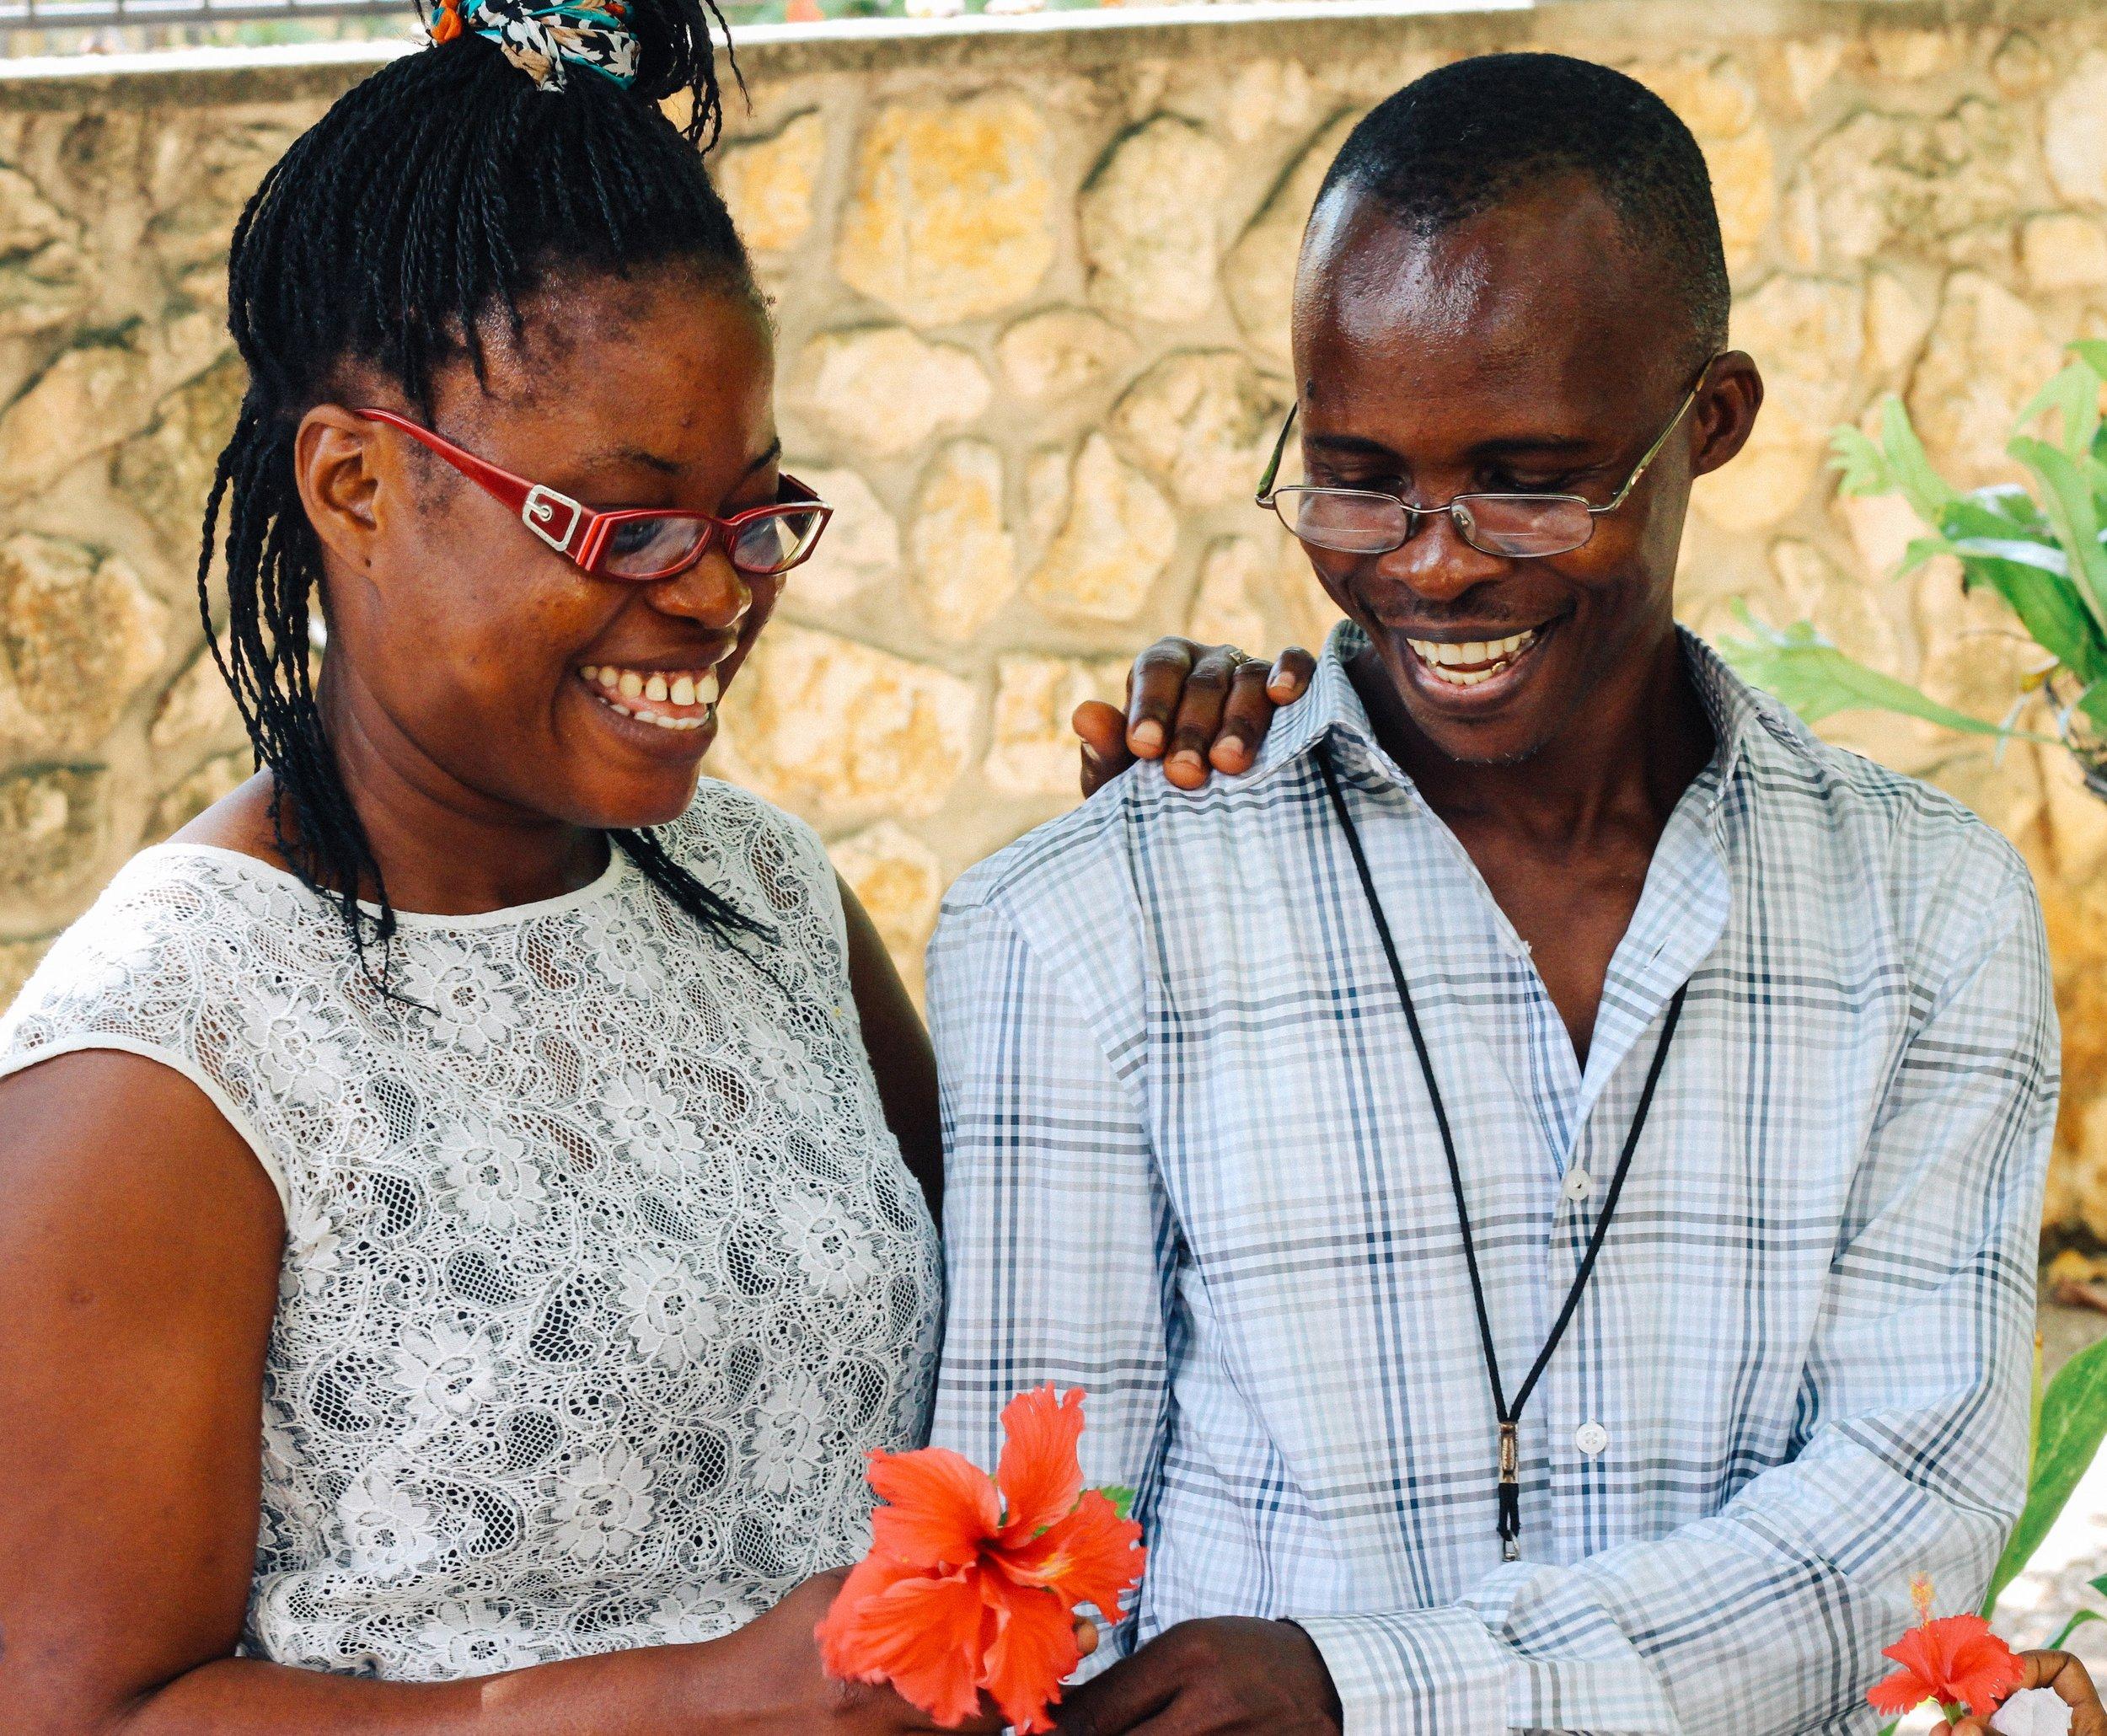 Joseph and his wife, Josette. MCC Photo/Ted Oswald